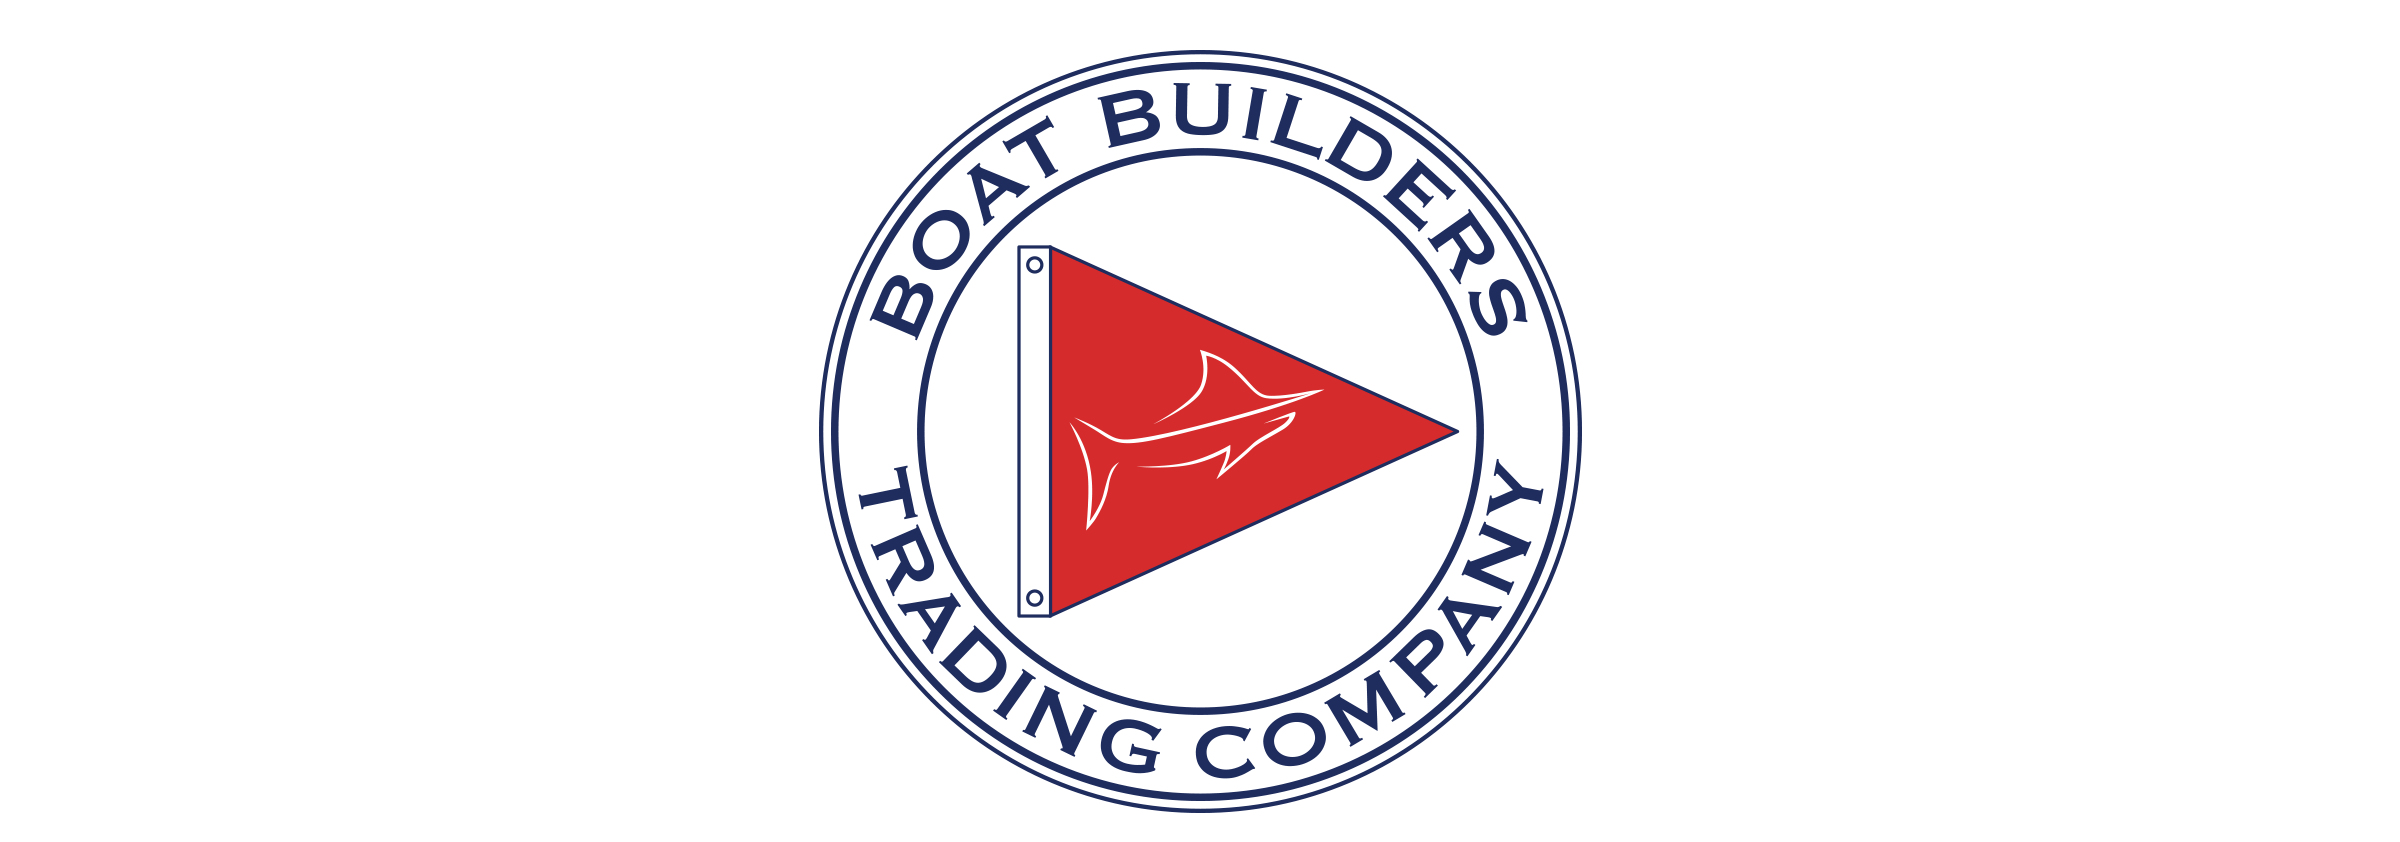 boatbuilderstradingco1.png